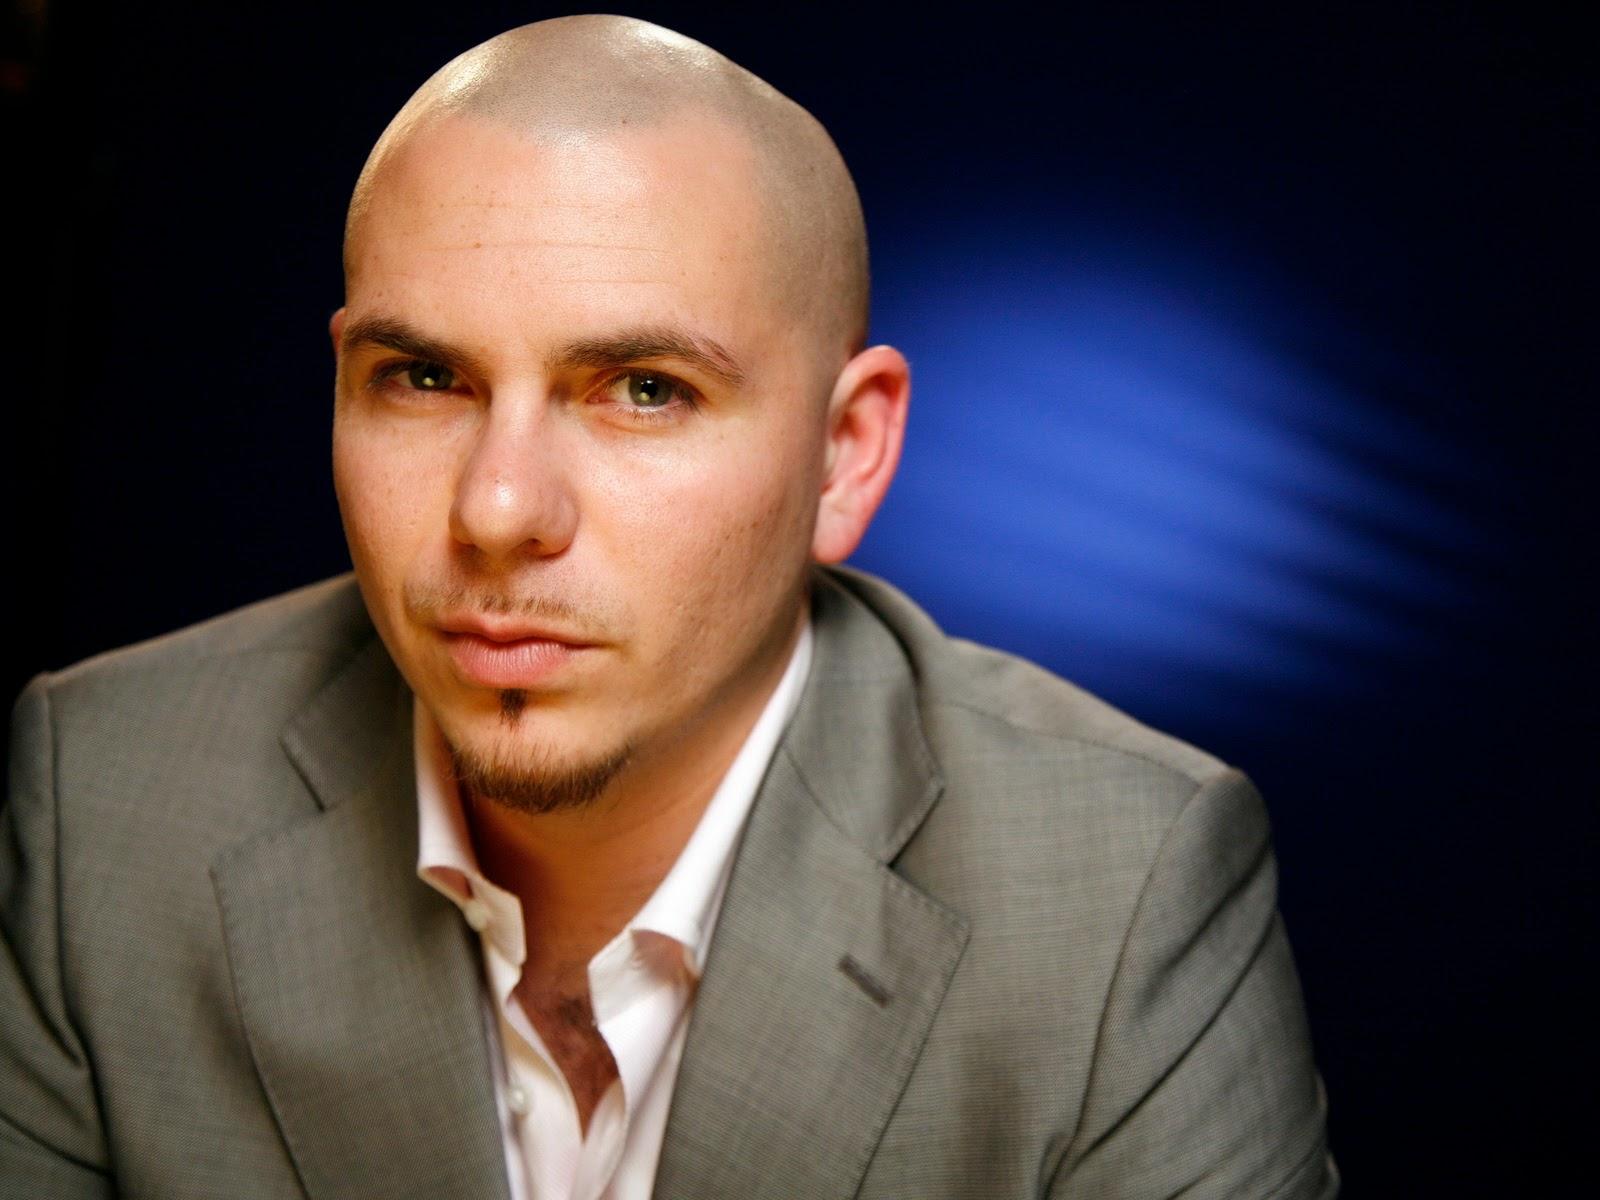 Profil dan Biografi Lengkap Pitbull